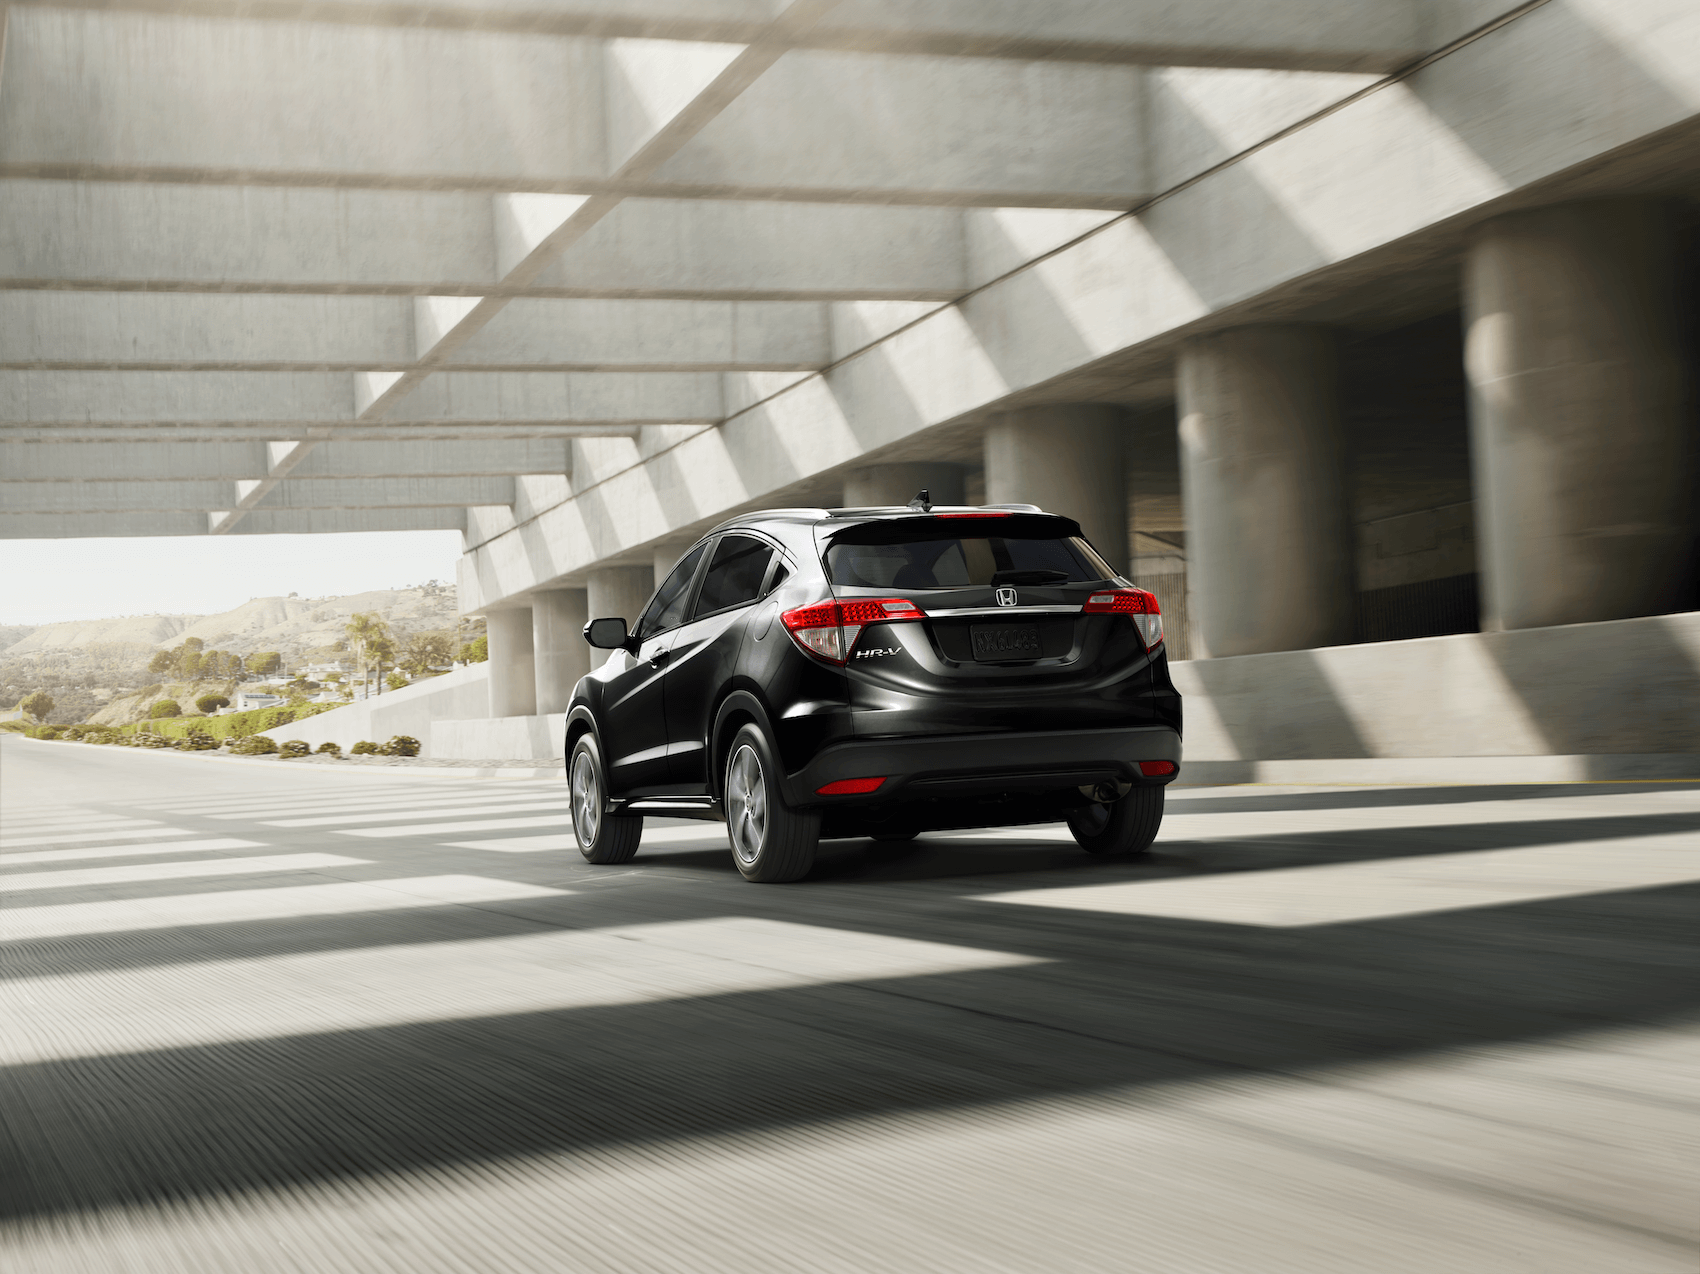 Honda HR-V Performance